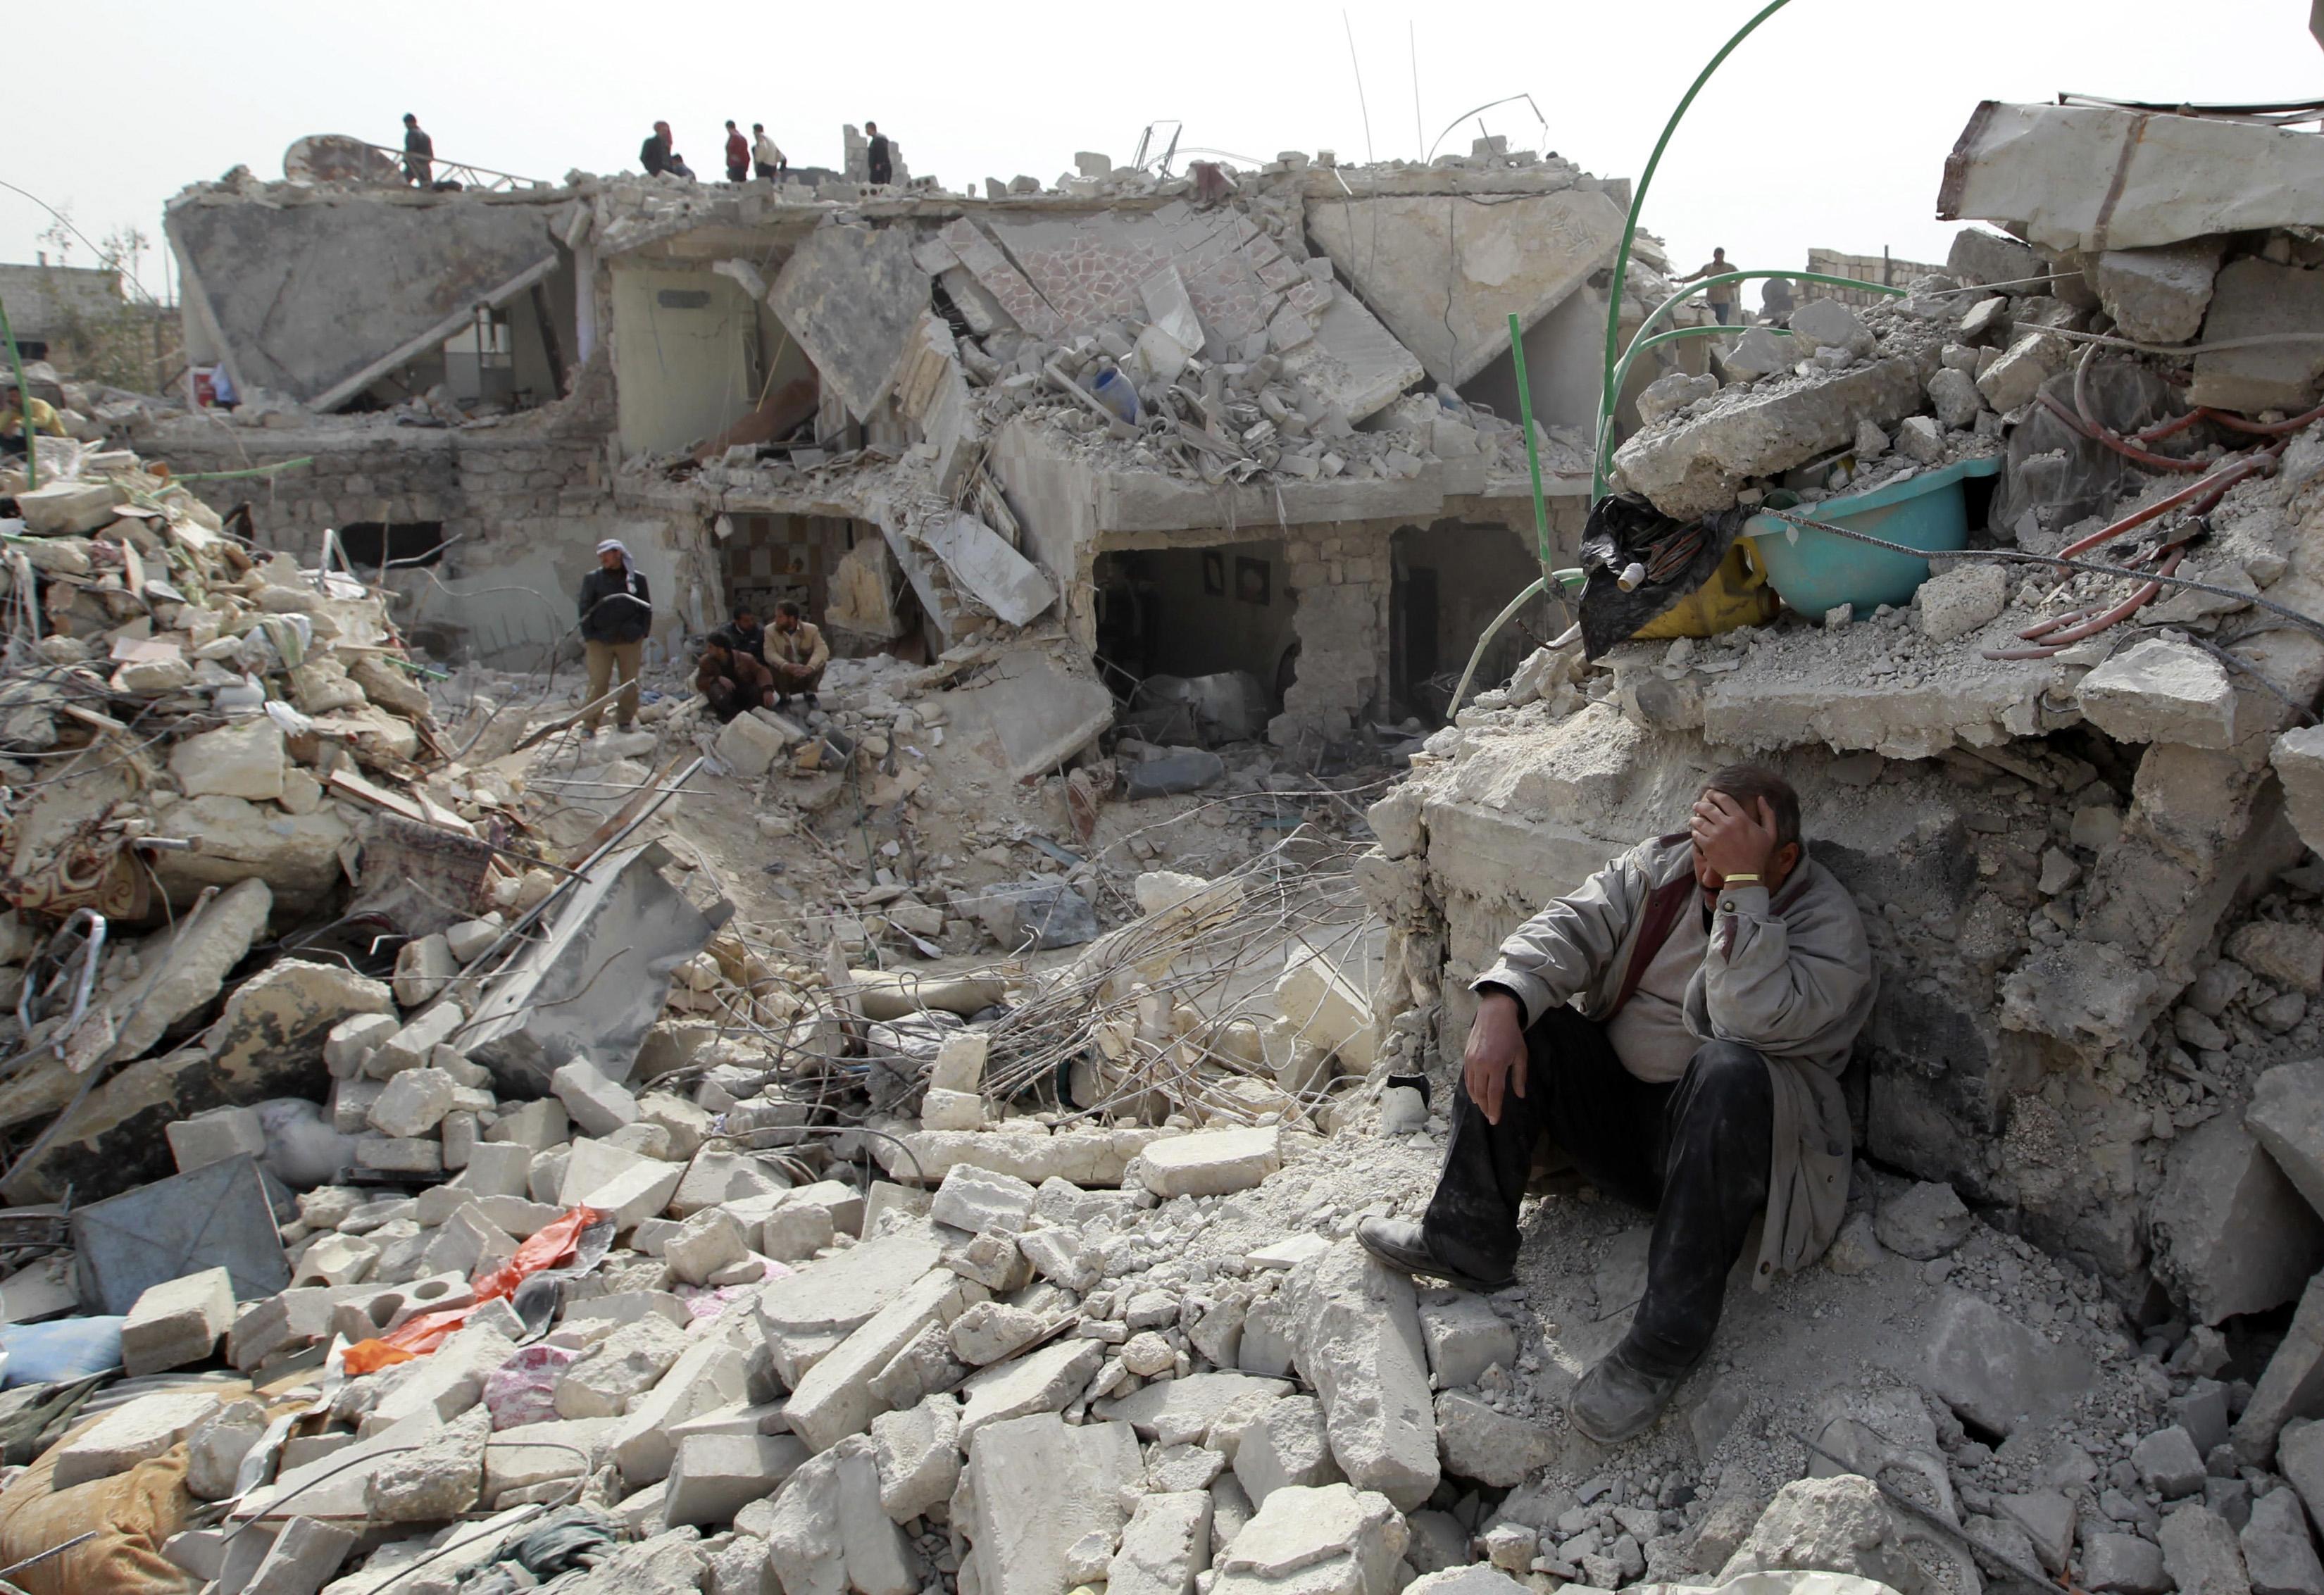 Photo: Reuters/Muzaffar Salman